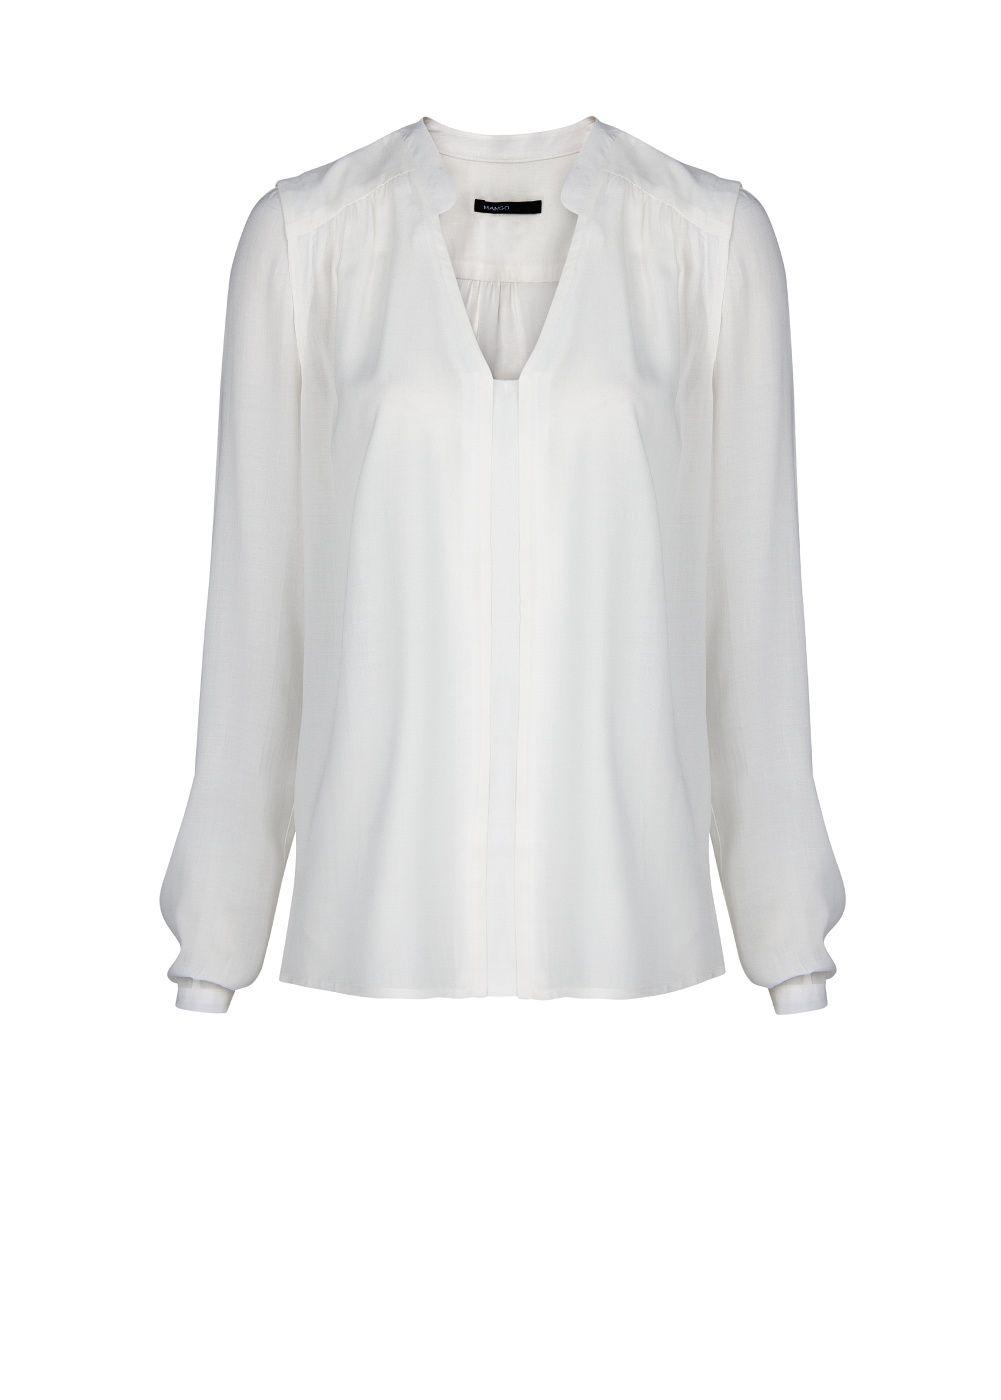 White Flowy Shirt | Is Shirt